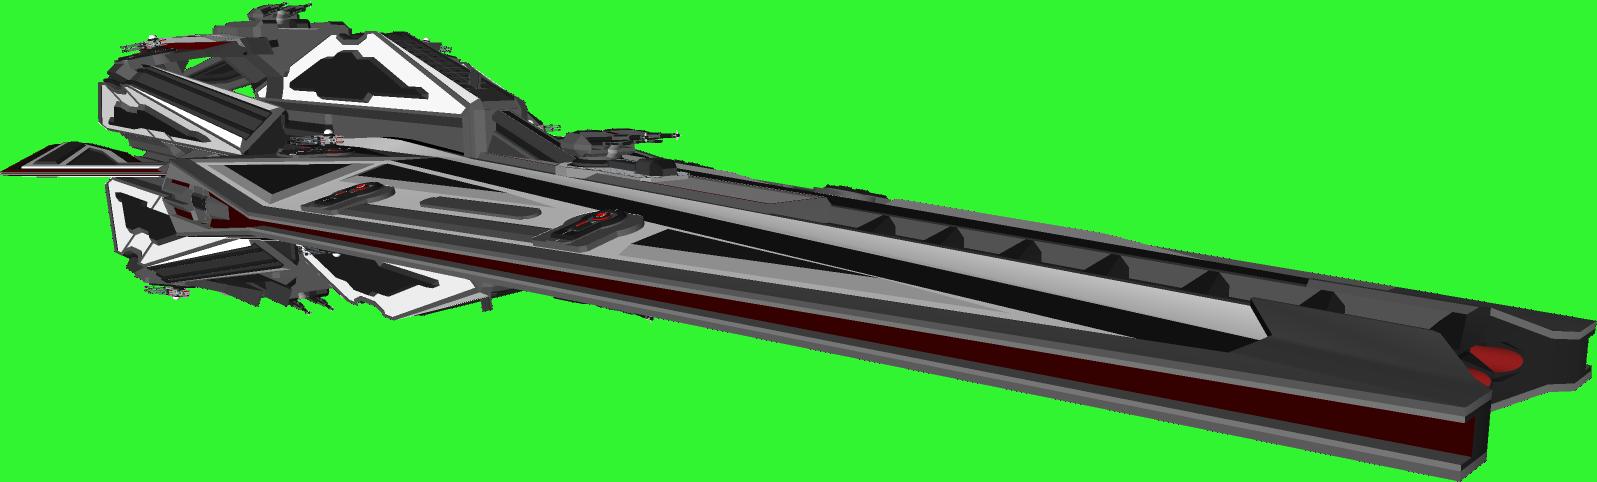 Pleiades-class frigate